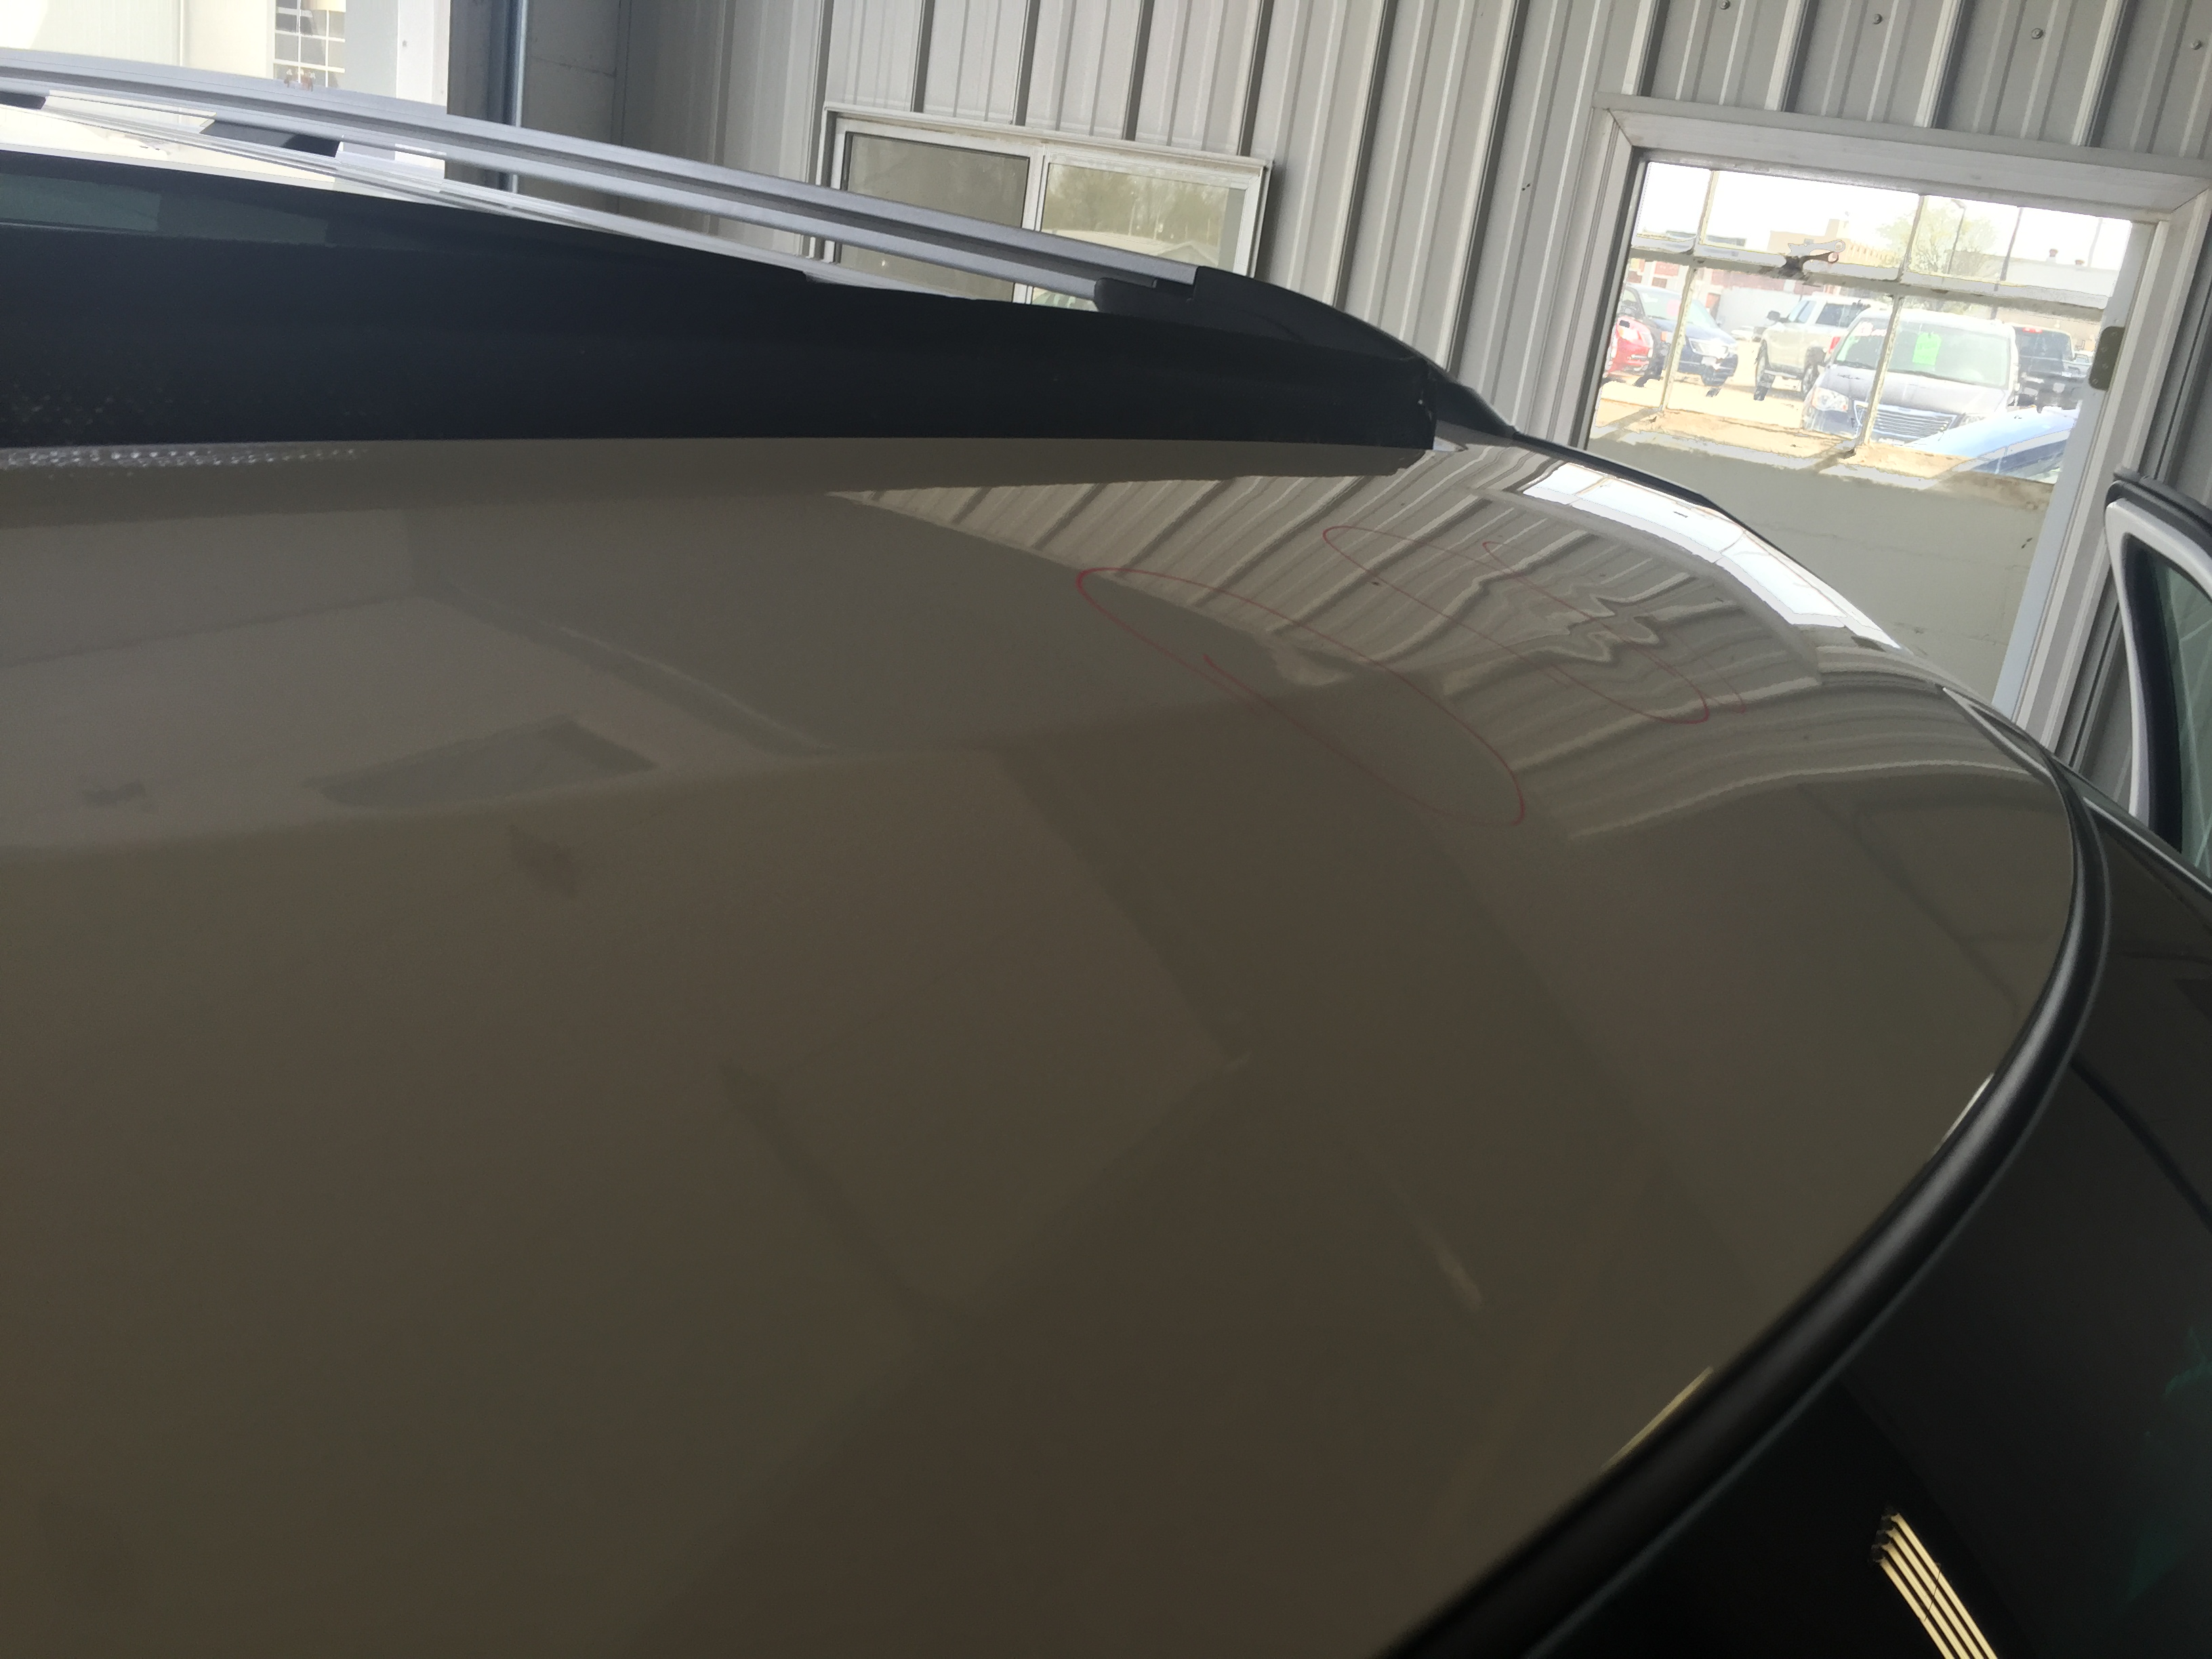 2014 Ford Explorer XLT Tri Coat White, Paintless Dent Repair Springfield IL, Pana IL Taylorville IL, Roof Dents